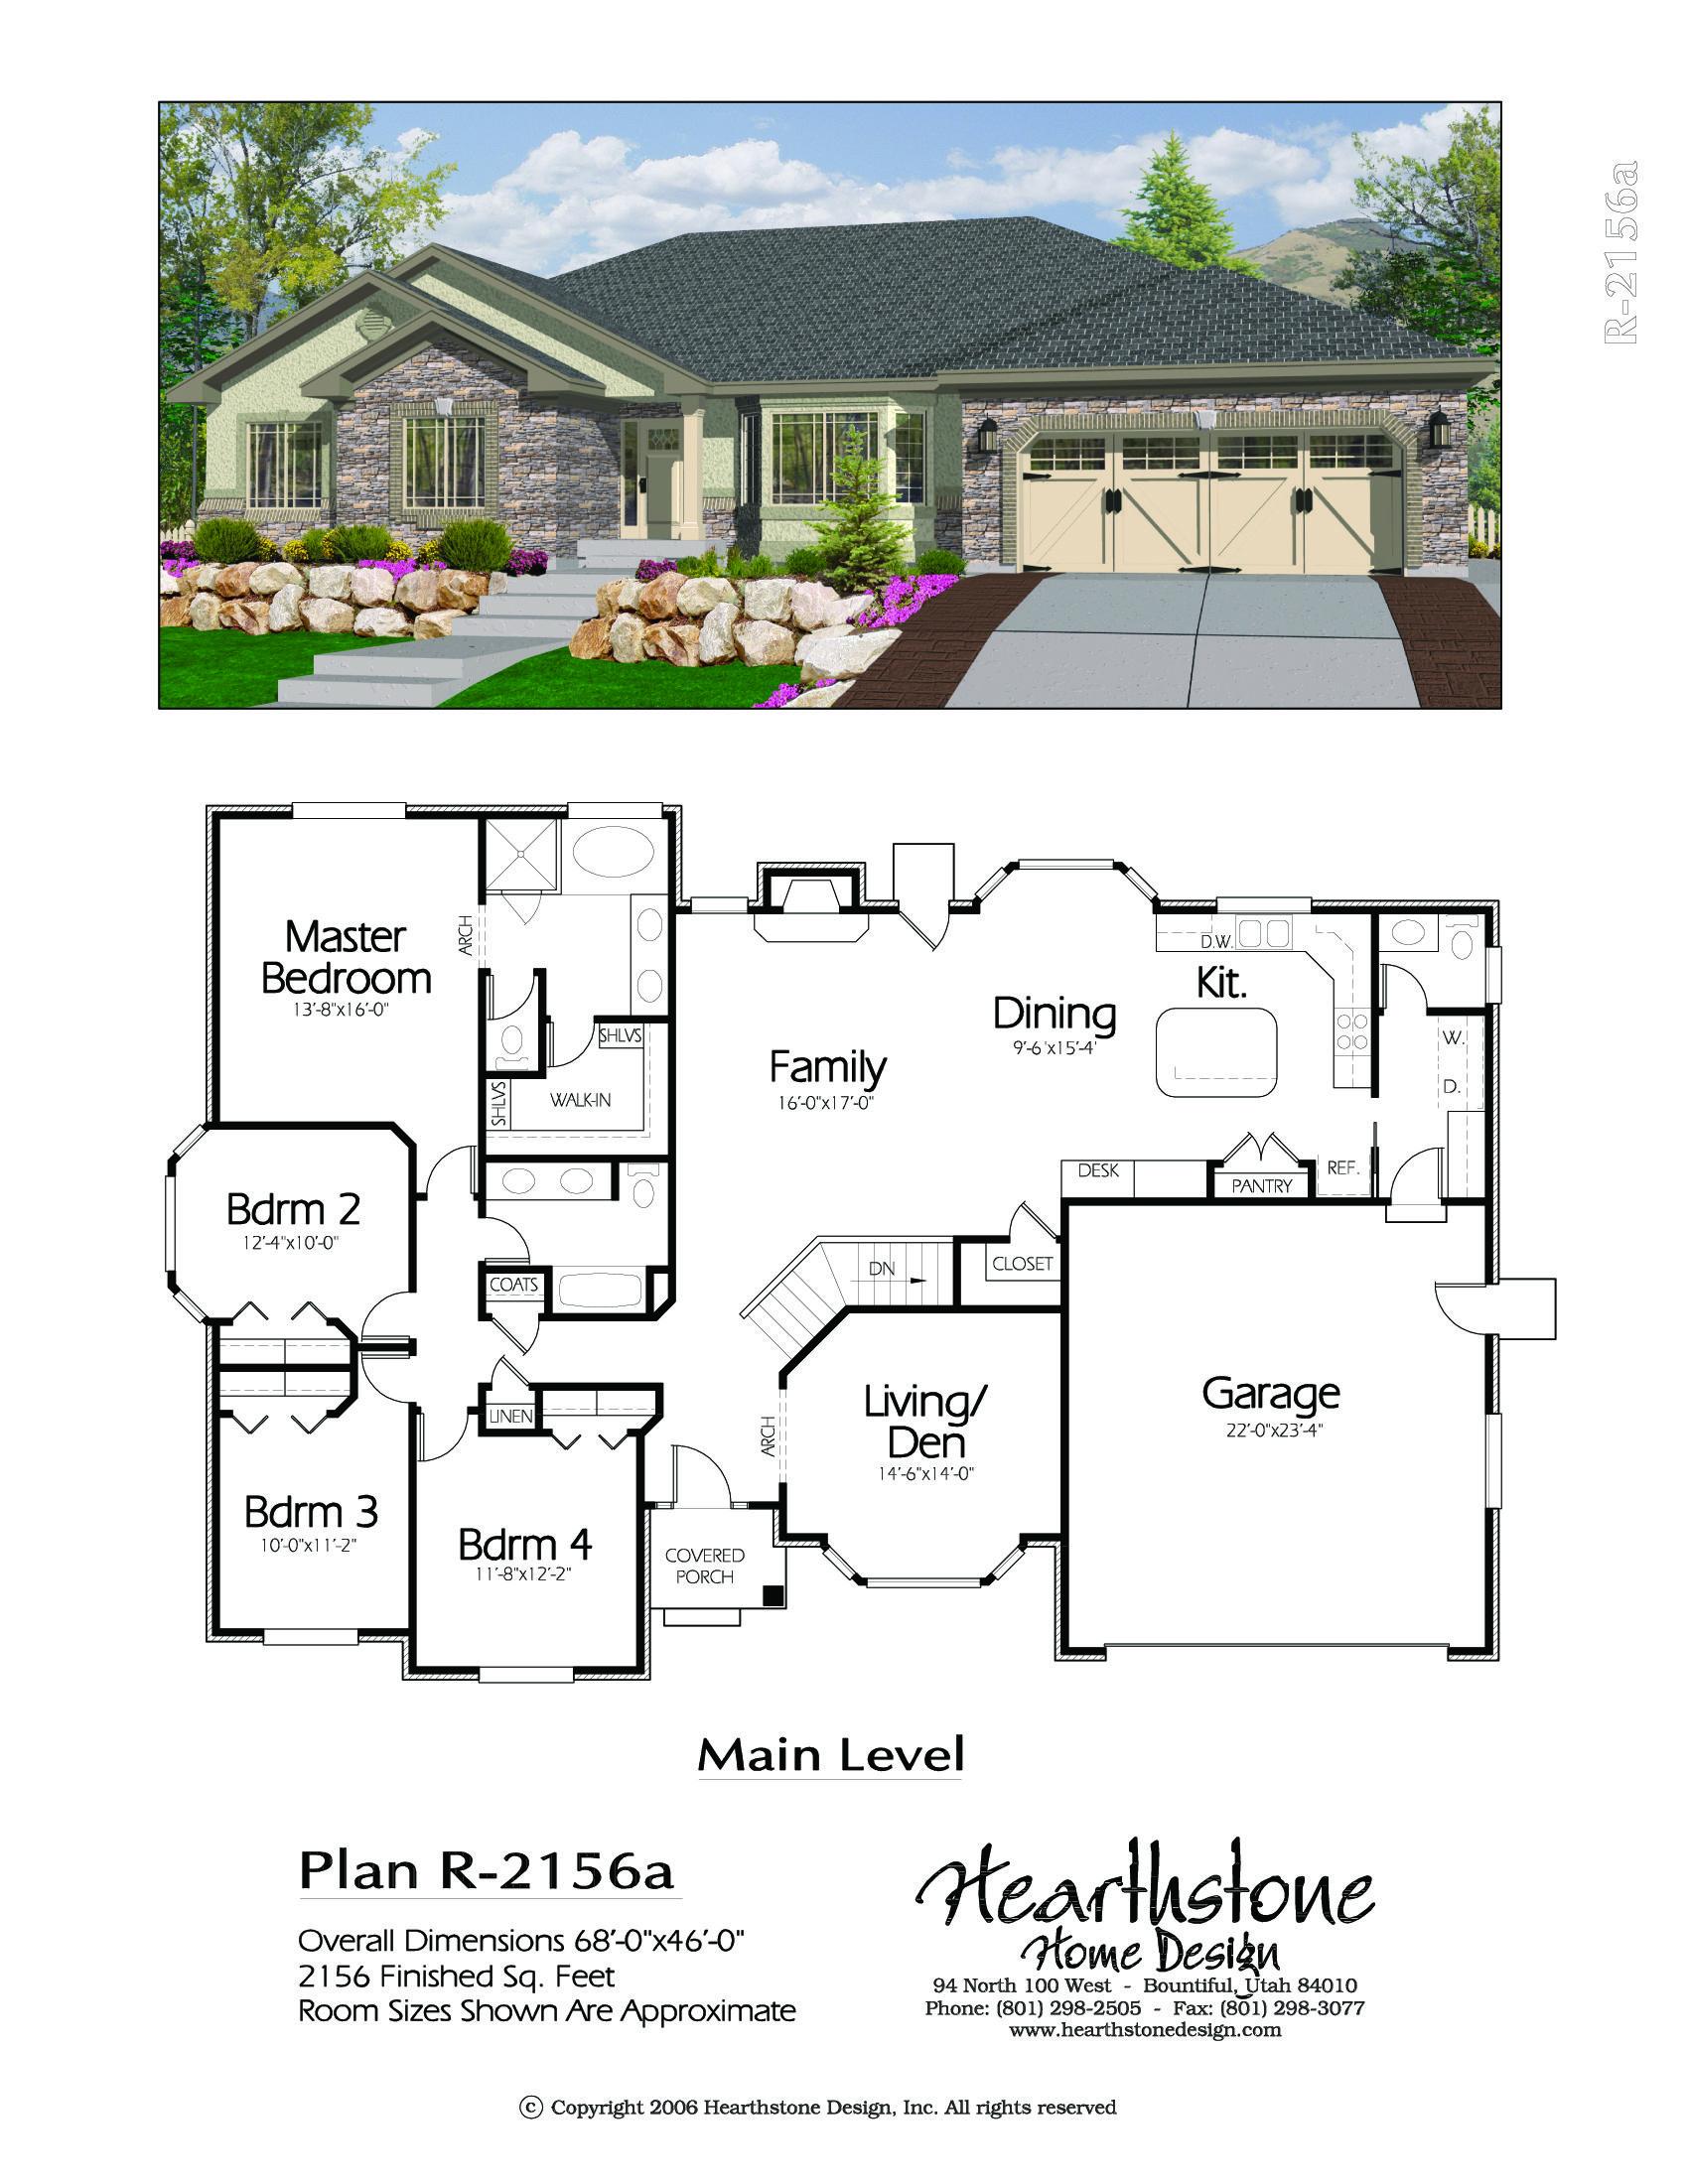 R 2156a Hearthstone Home Design New House Plans Modern House Floor Plans House Blueprints